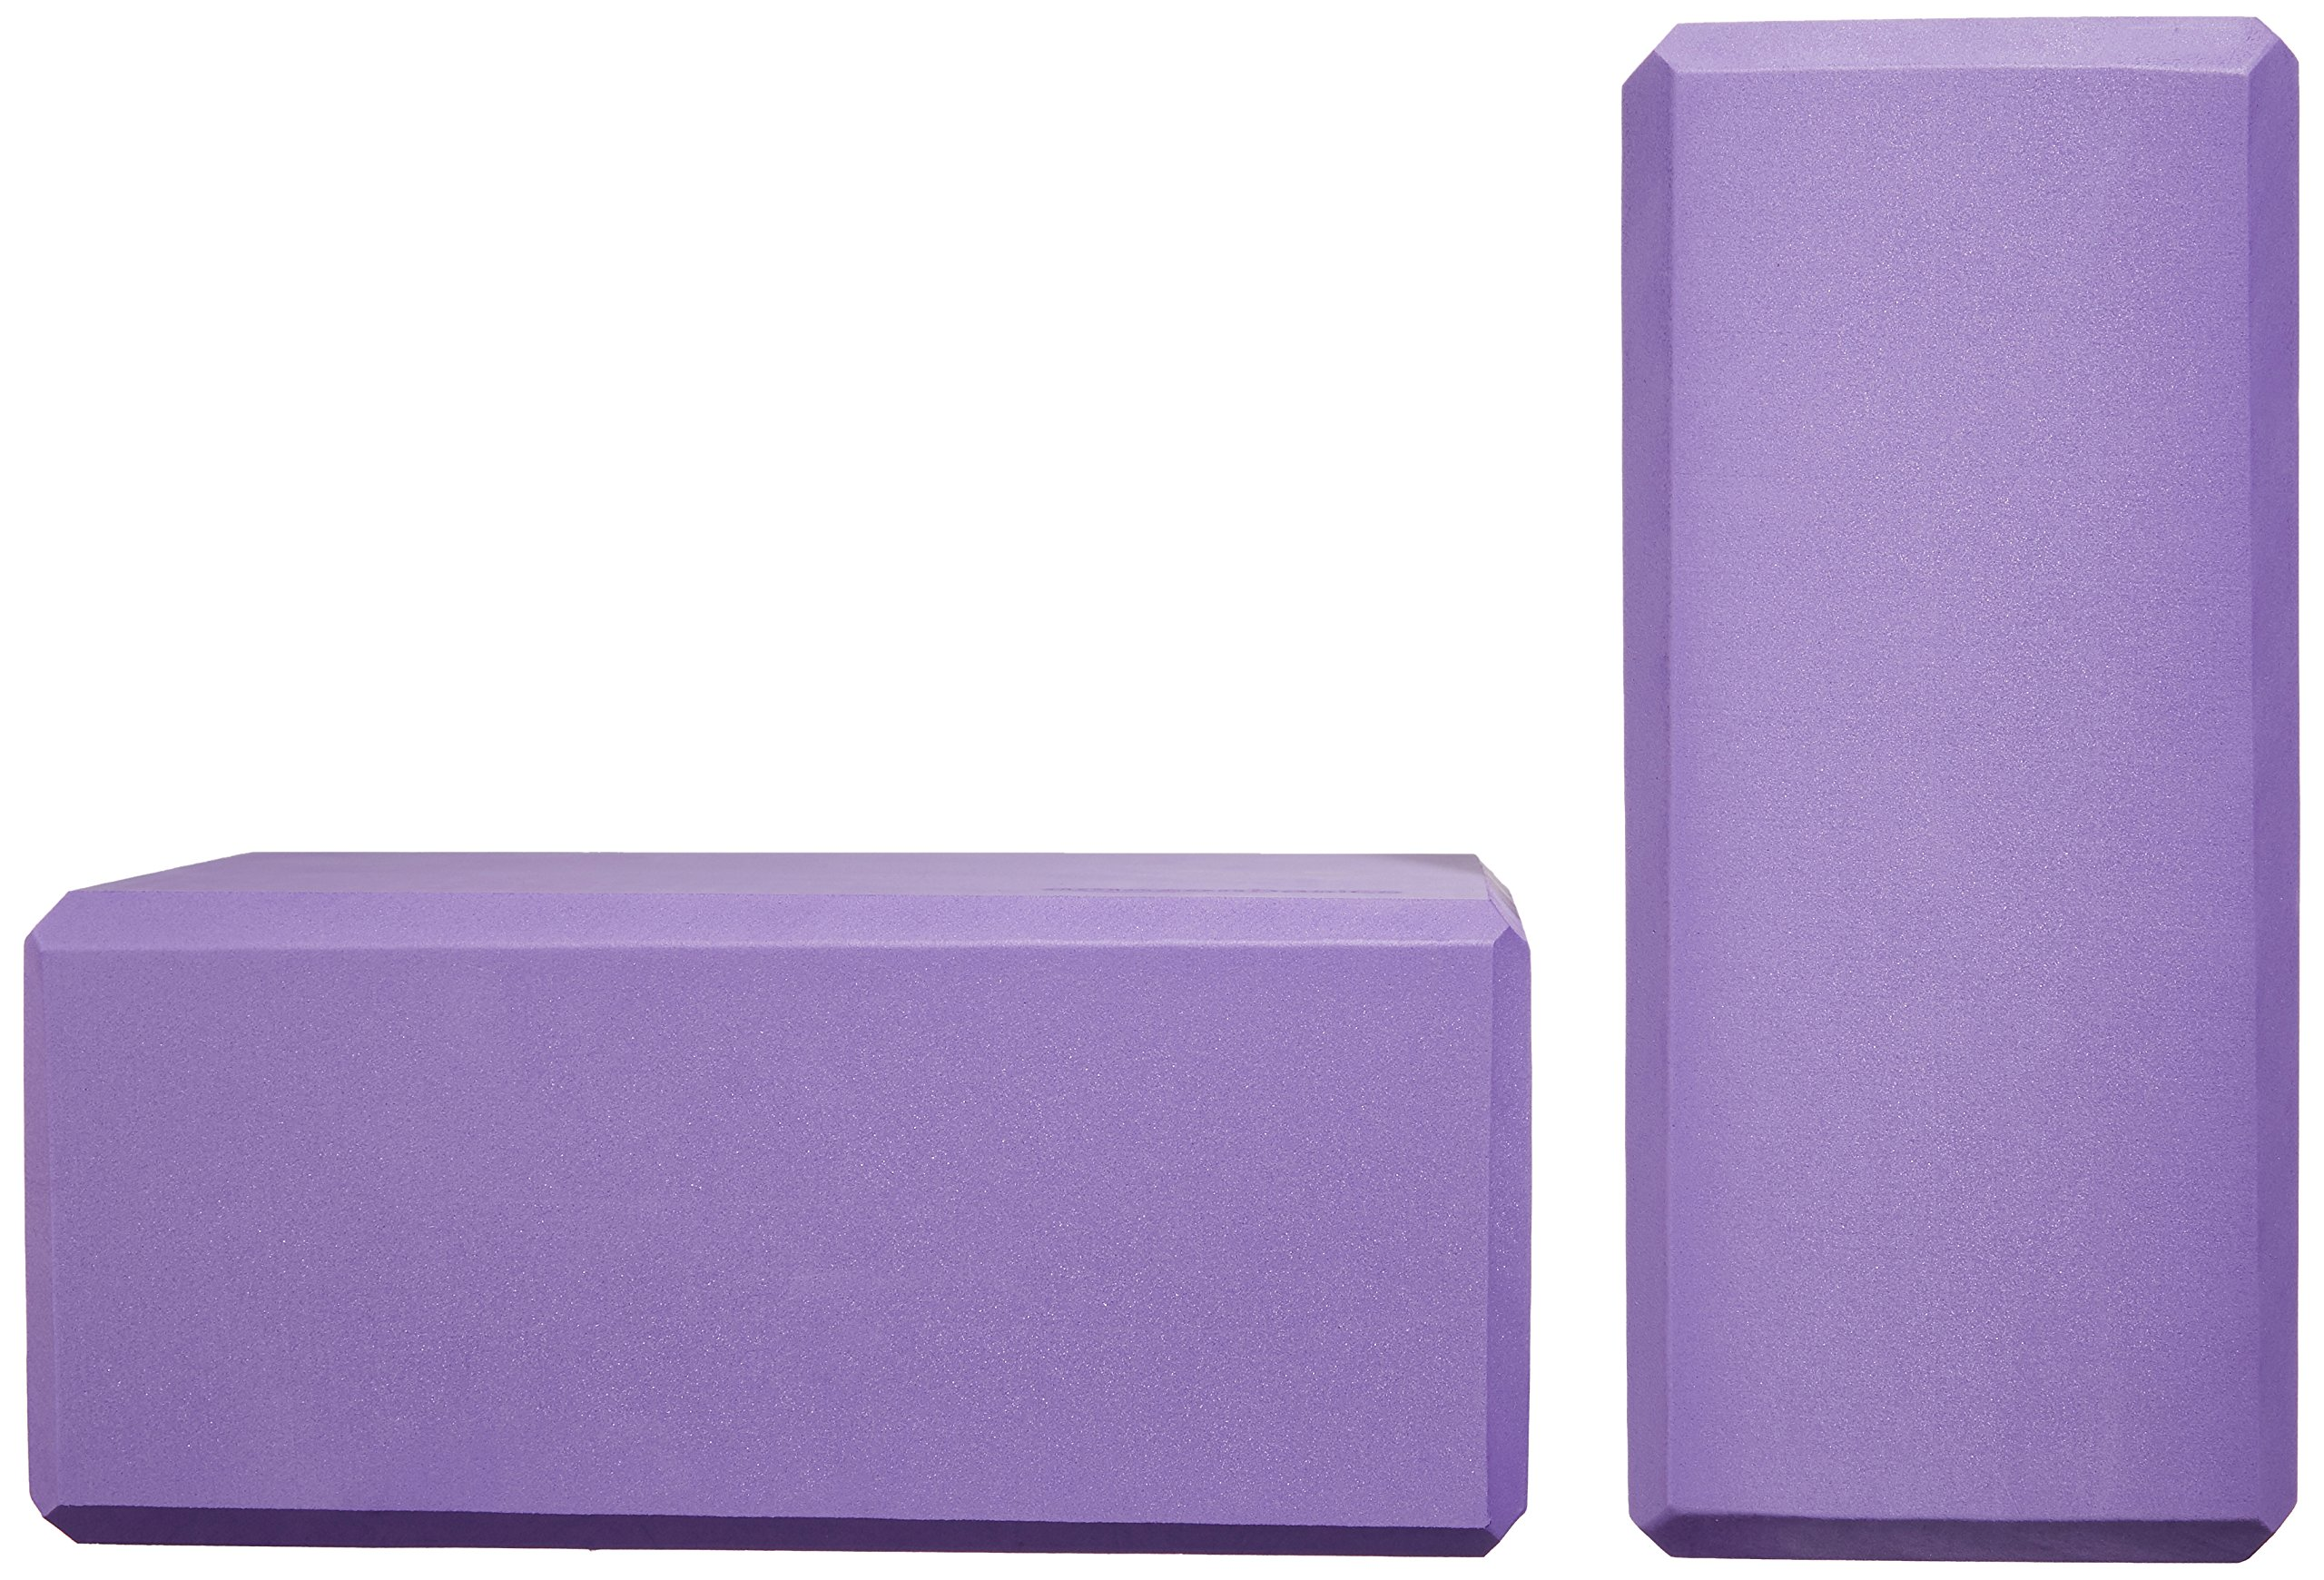 AmazonBasics Foam Yoga Blocks - 4 x 9 x 6 Inches, Set of 2, Purple by AmazonBasics (Image #5)